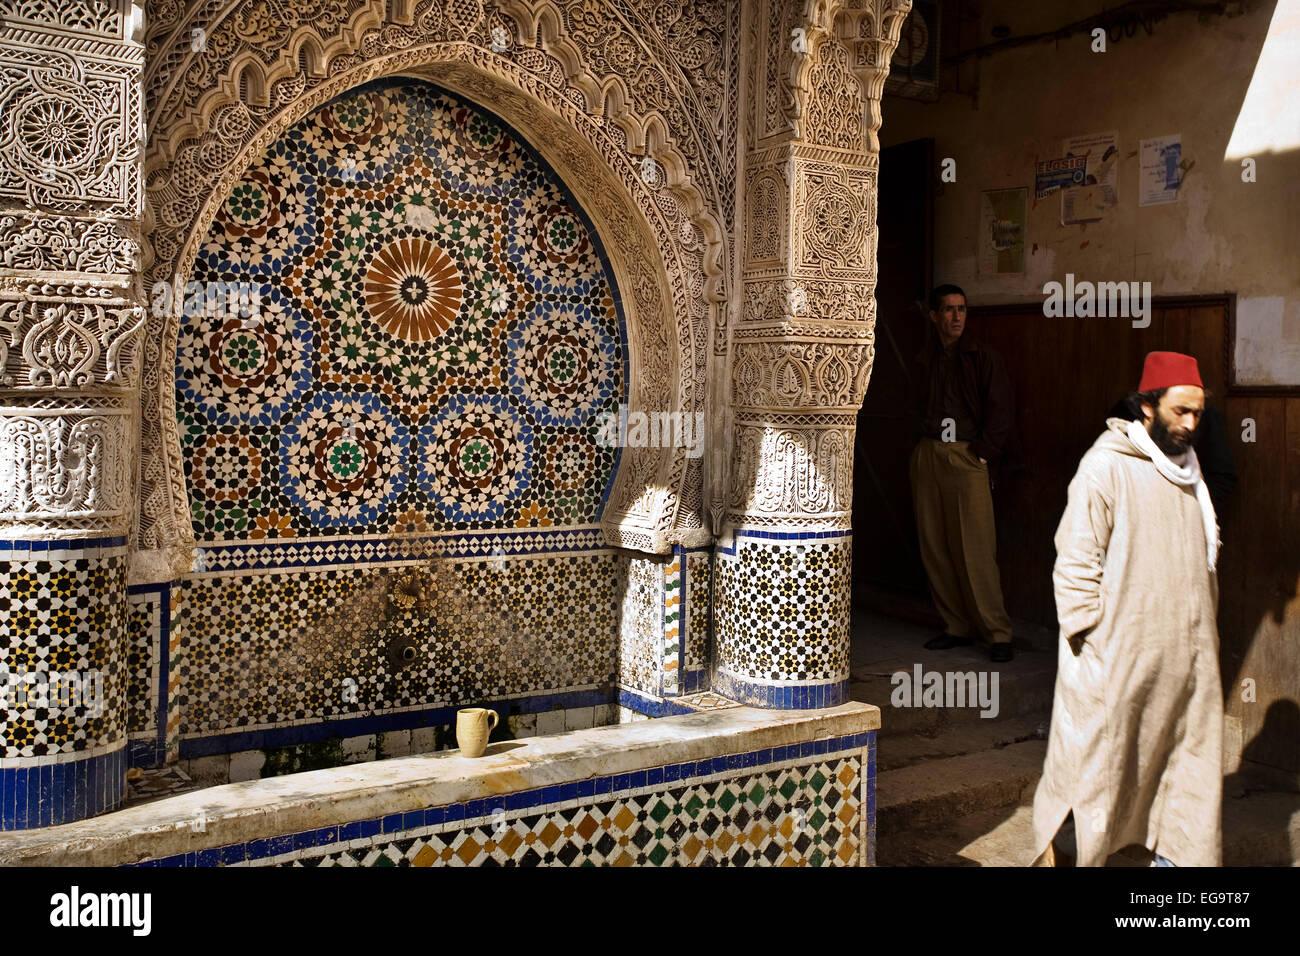 najjarine square medina fez fes el bali morocco fuente en la plaza najjarine en la medina